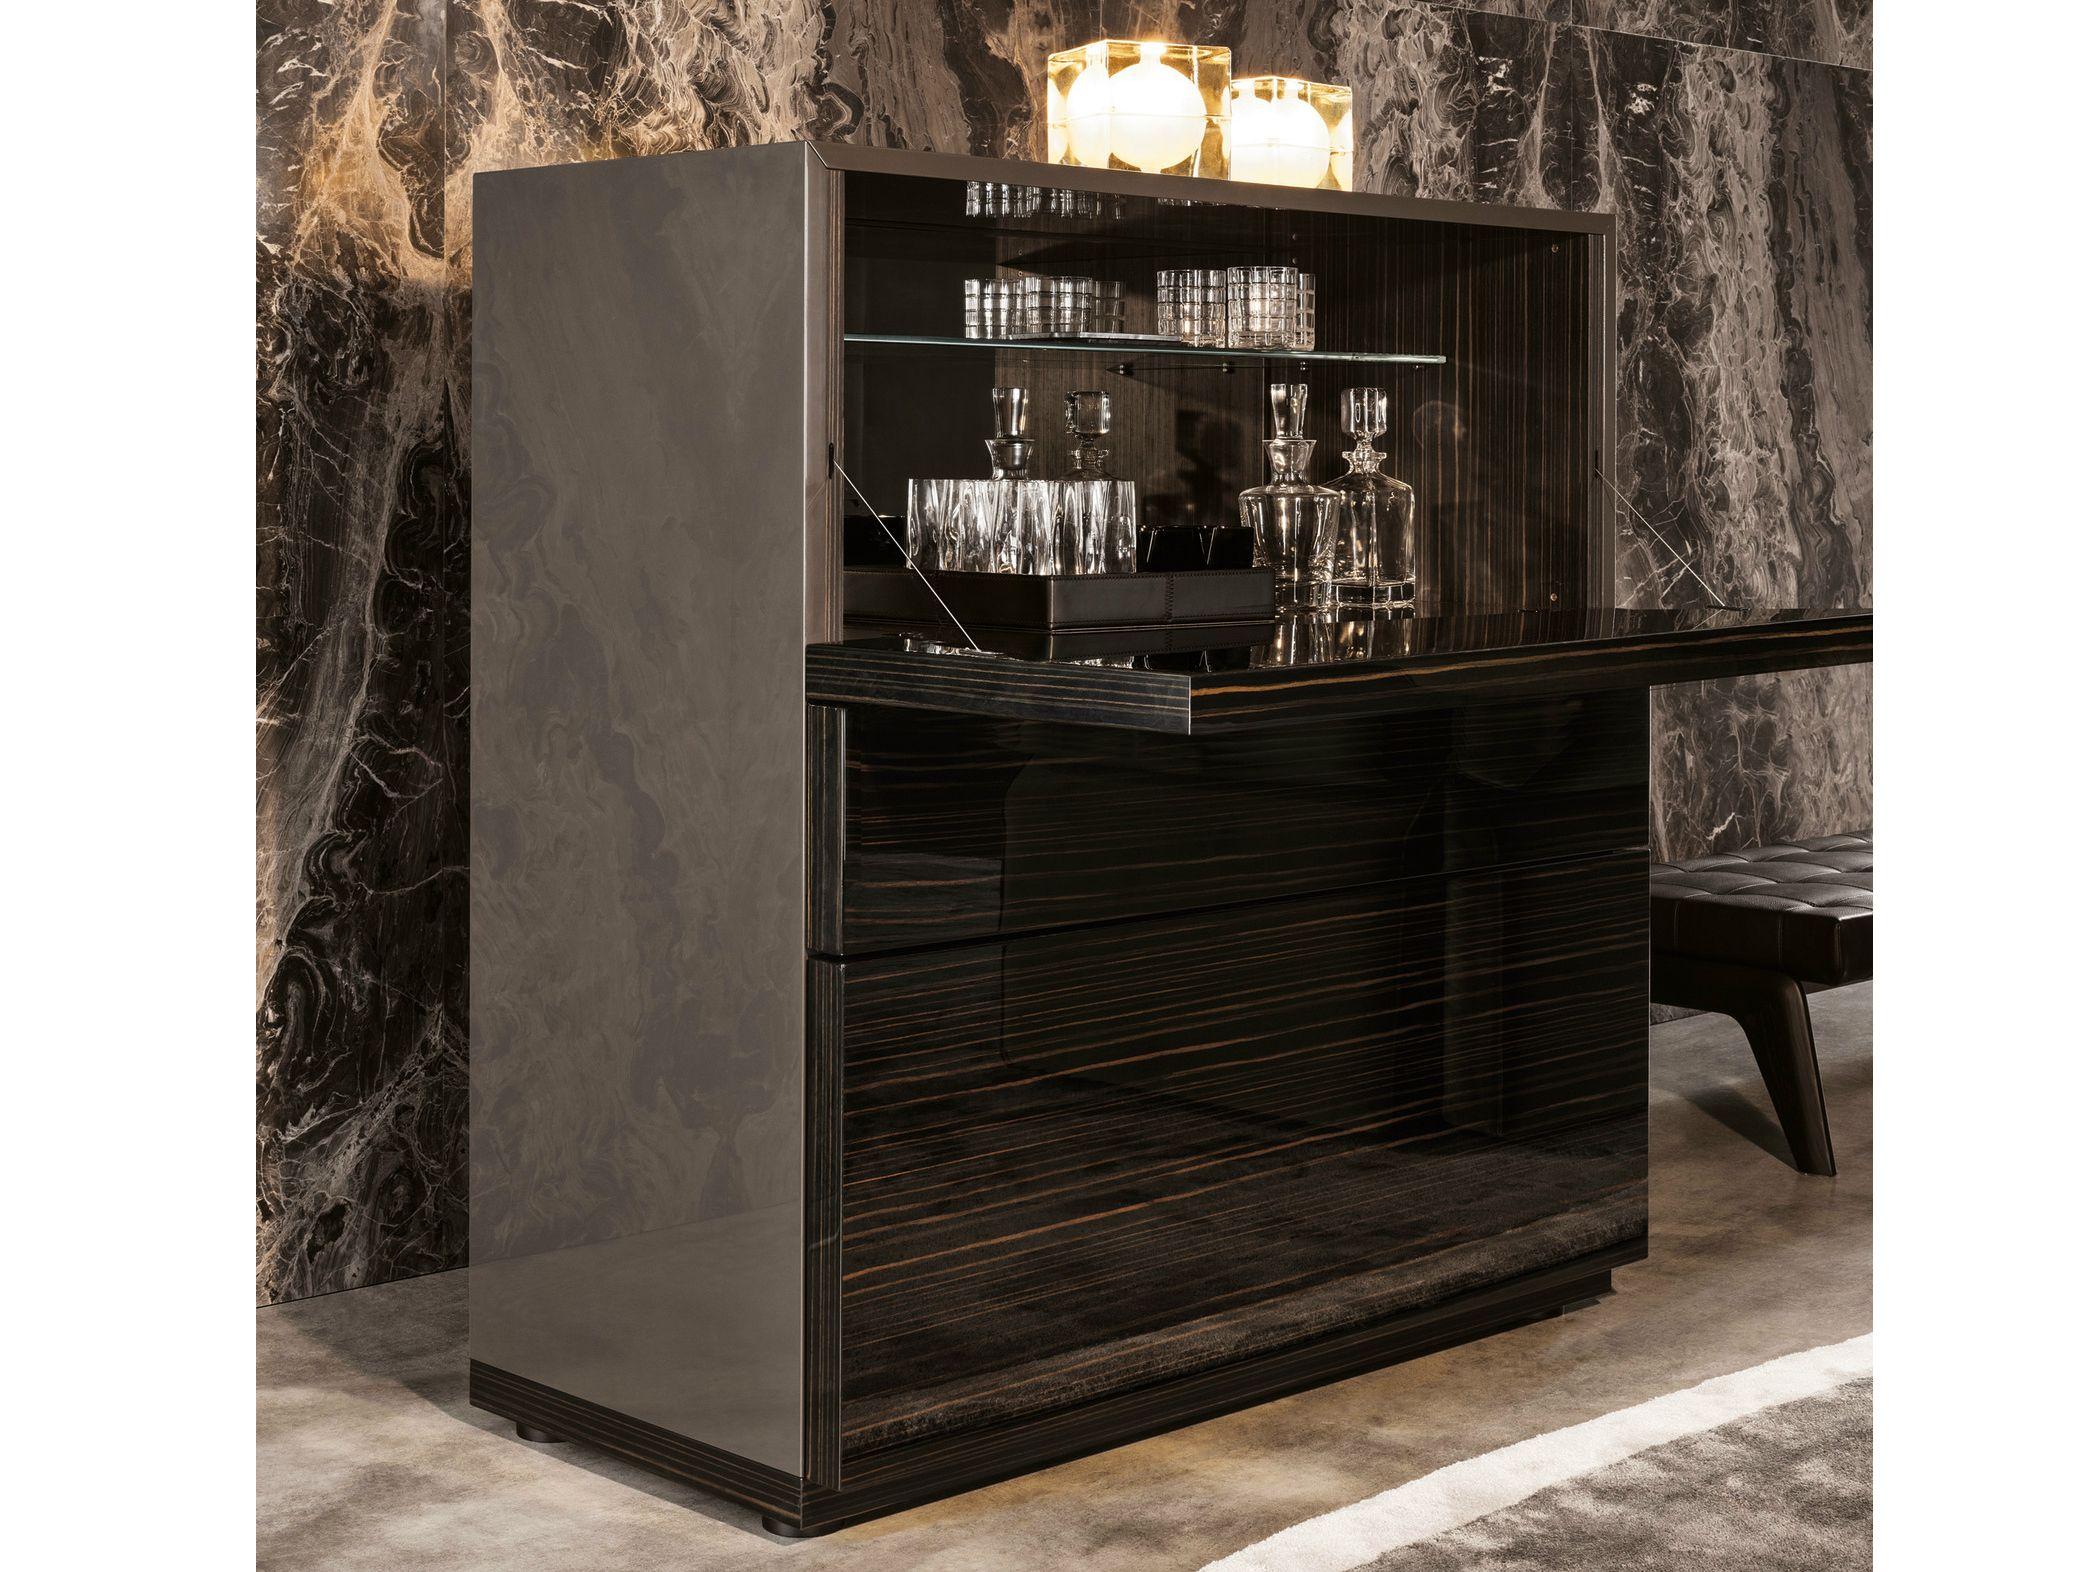 LANG Bar cabinet by Minotti design Rodolfo Dordoni   home bar ...